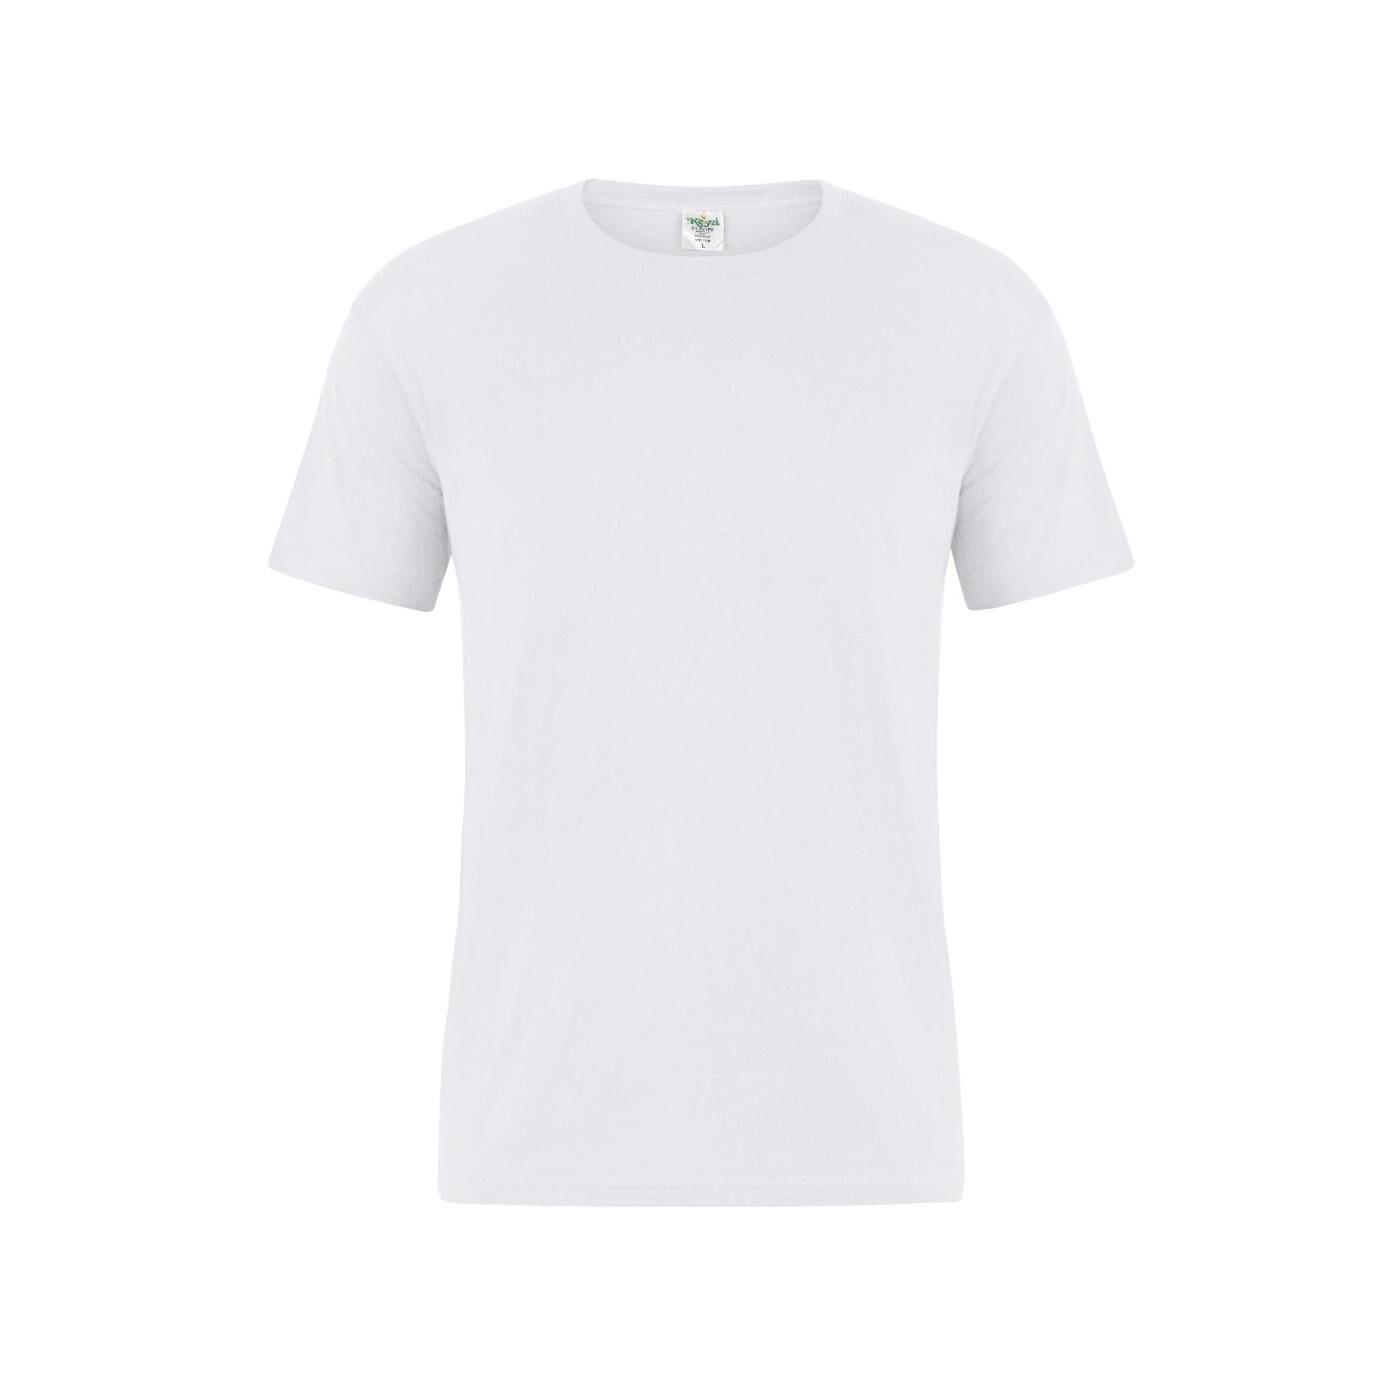 Celestino Βαμβακερό ανδρικό T-shirt  - Λευκο - Grootte: Large